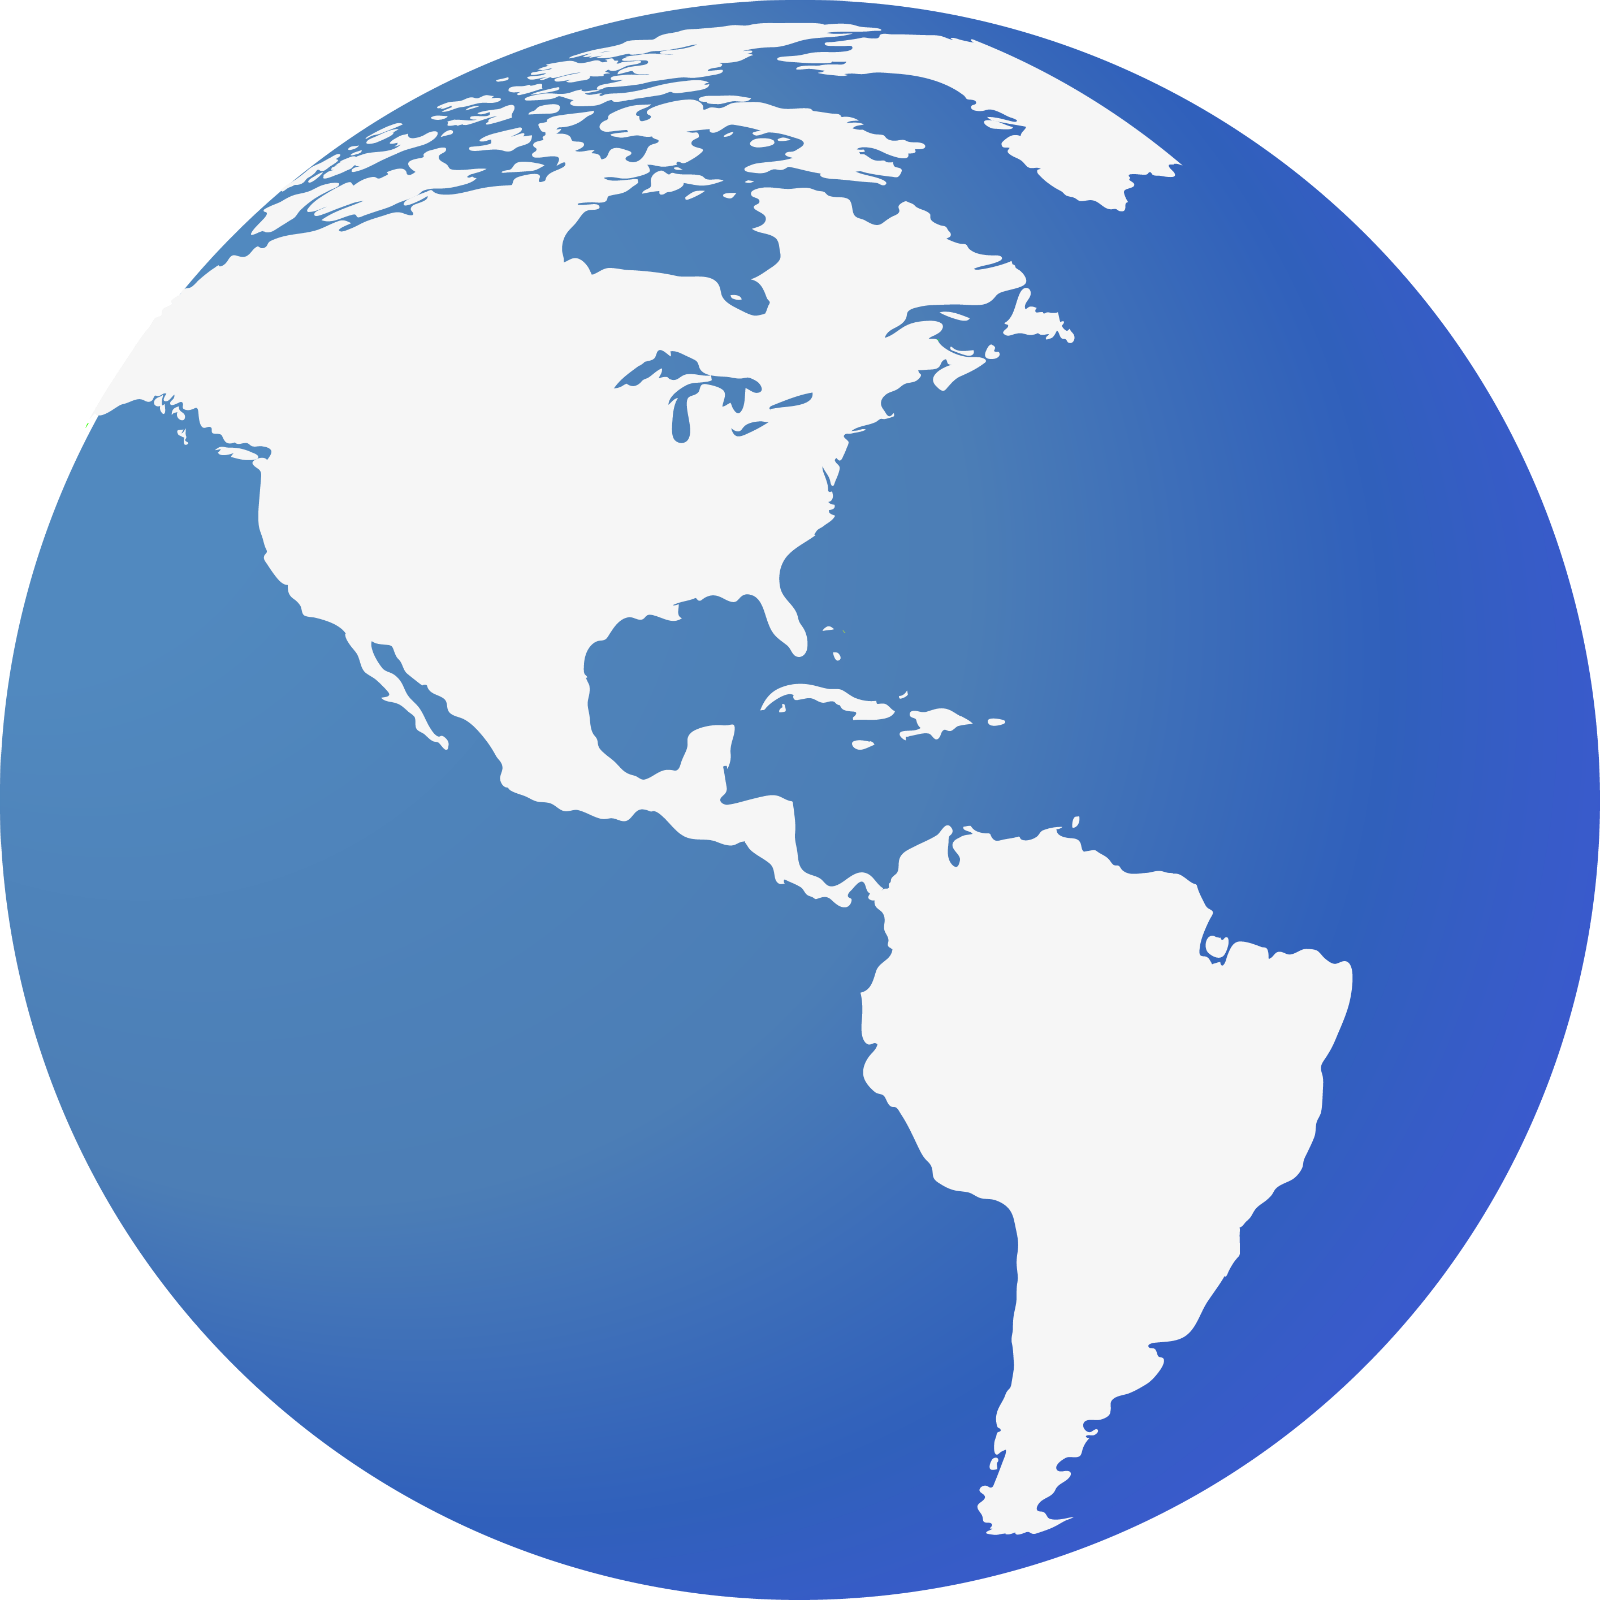 Blue And White Globe Logo | www.galleryhip.com - The ...